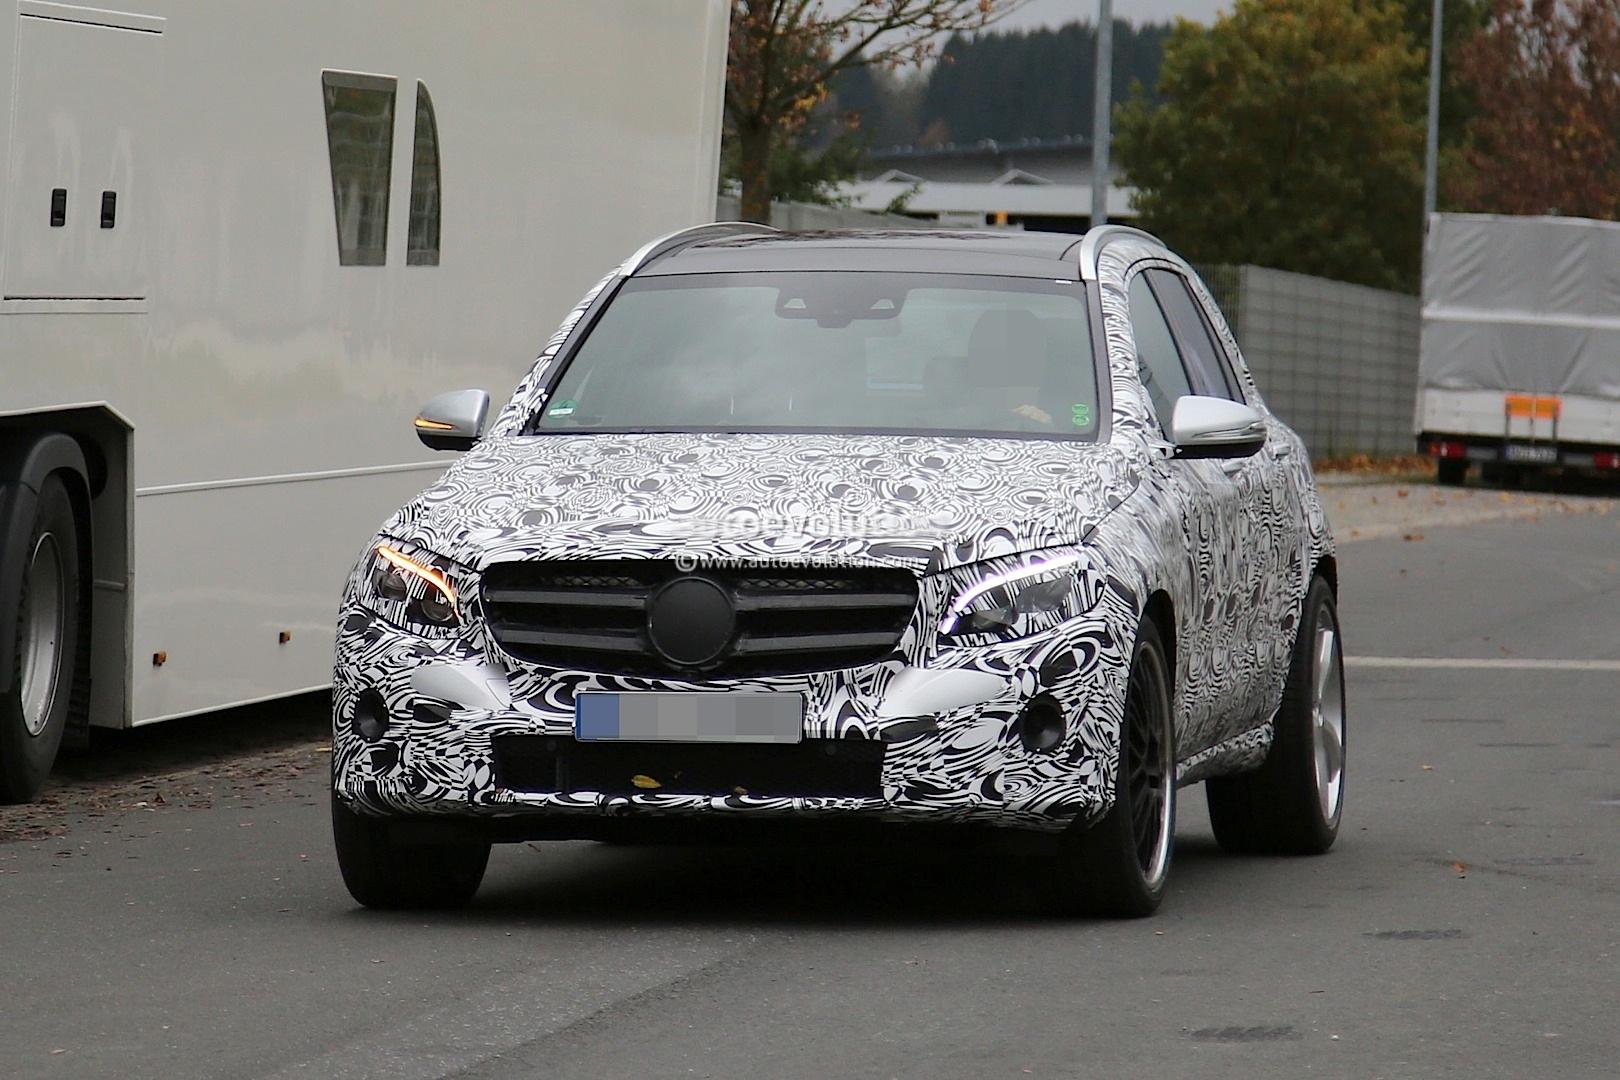 Mercedes-Benz GLC63 AMG First Spyshots: GLK Successor with 4.0-liter V8 - autoevolution